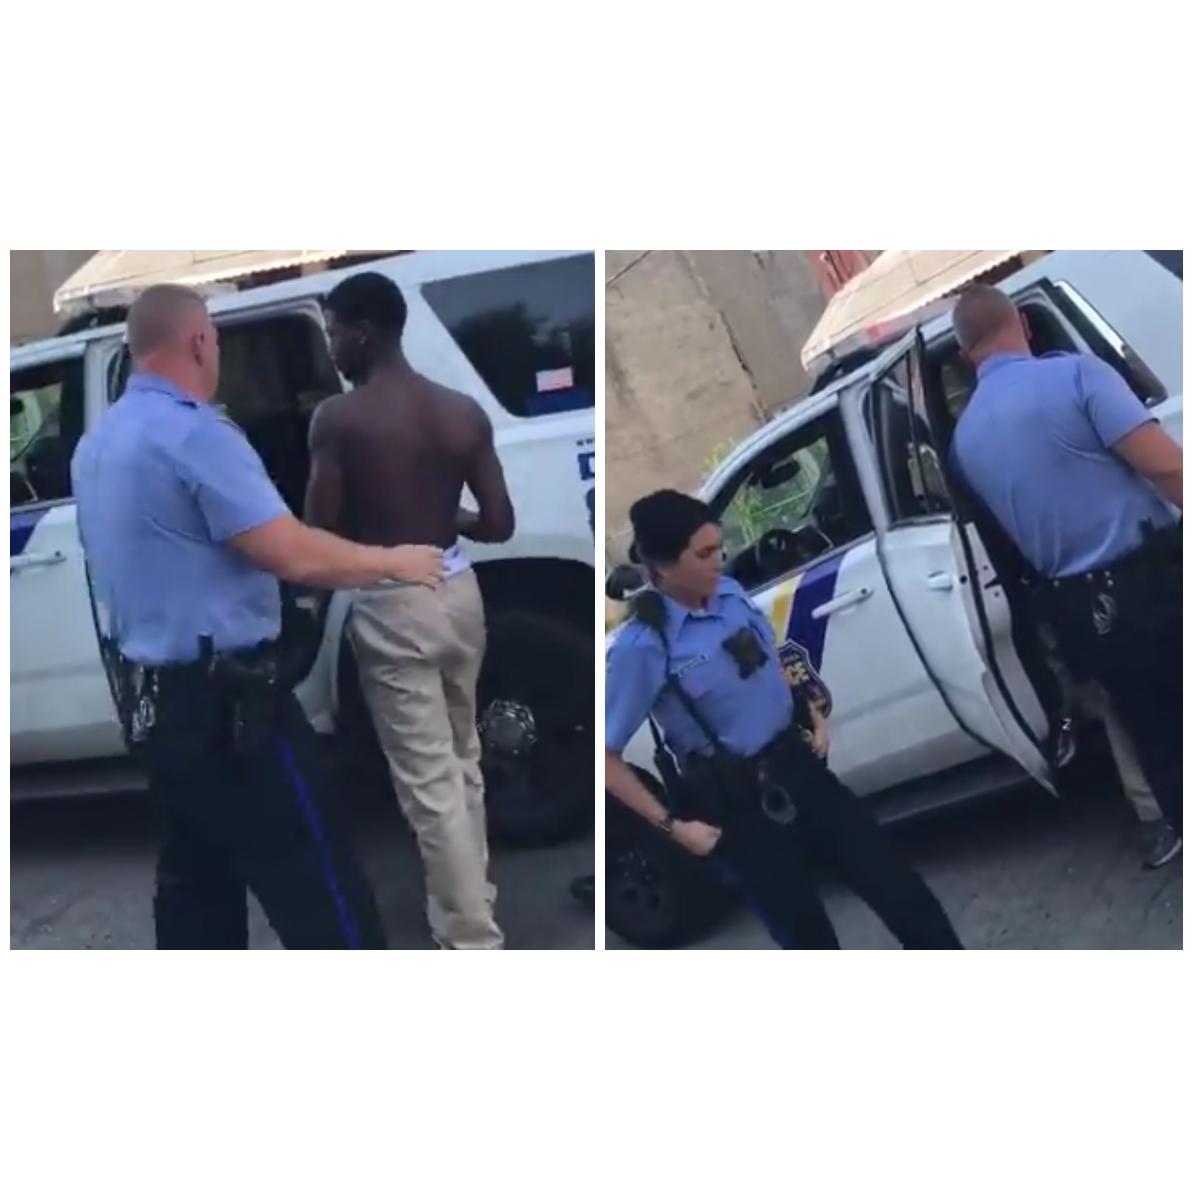 White Philadelphia Cops Harass Shirtless Black Boy Waiting For Bus